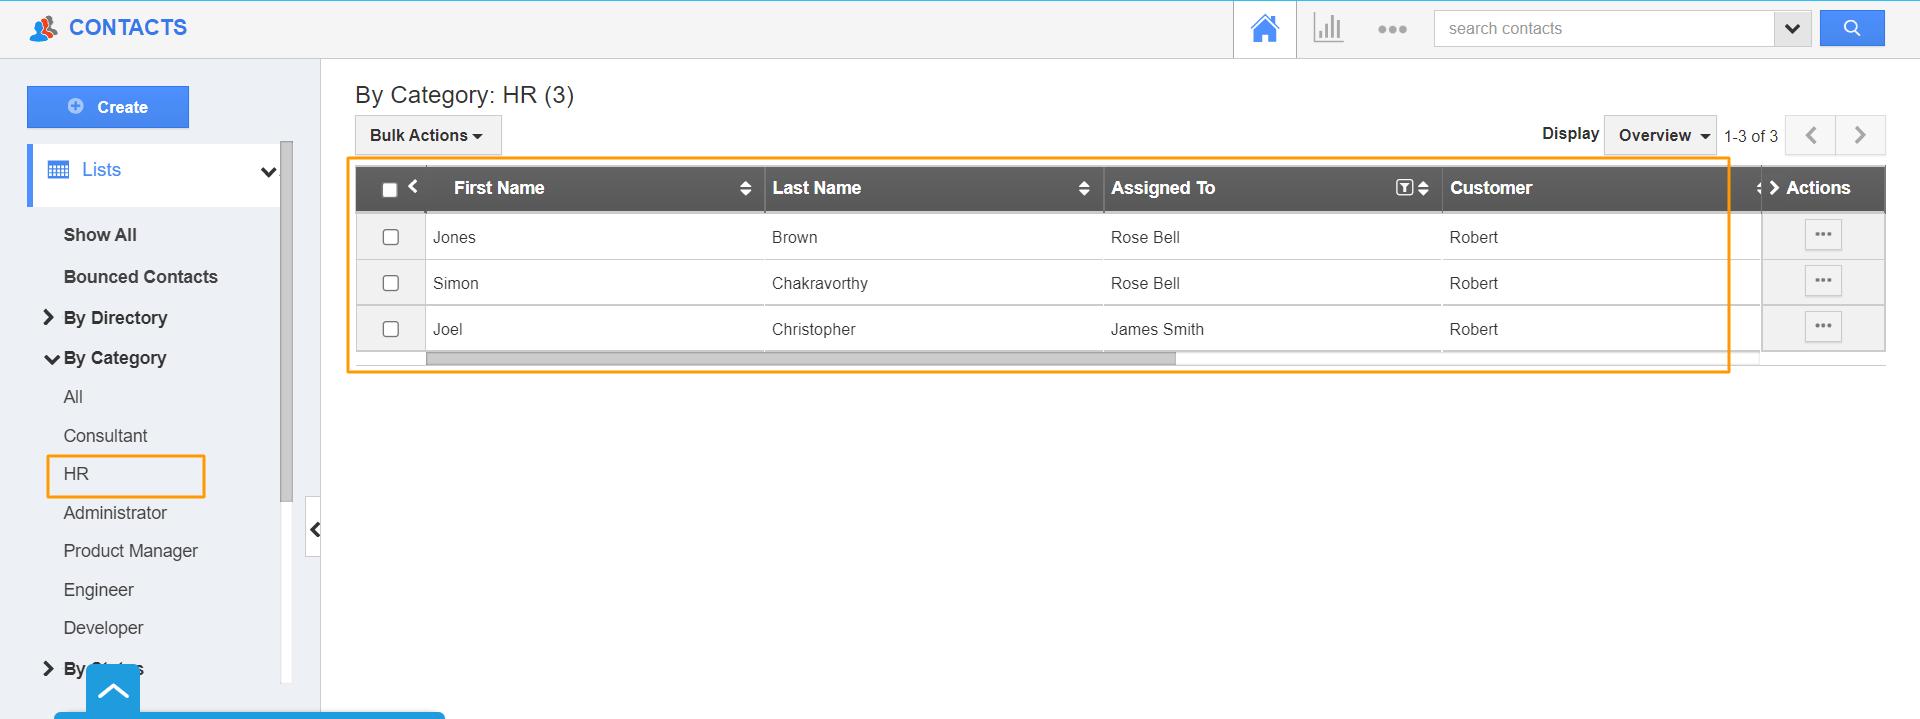 HR Category